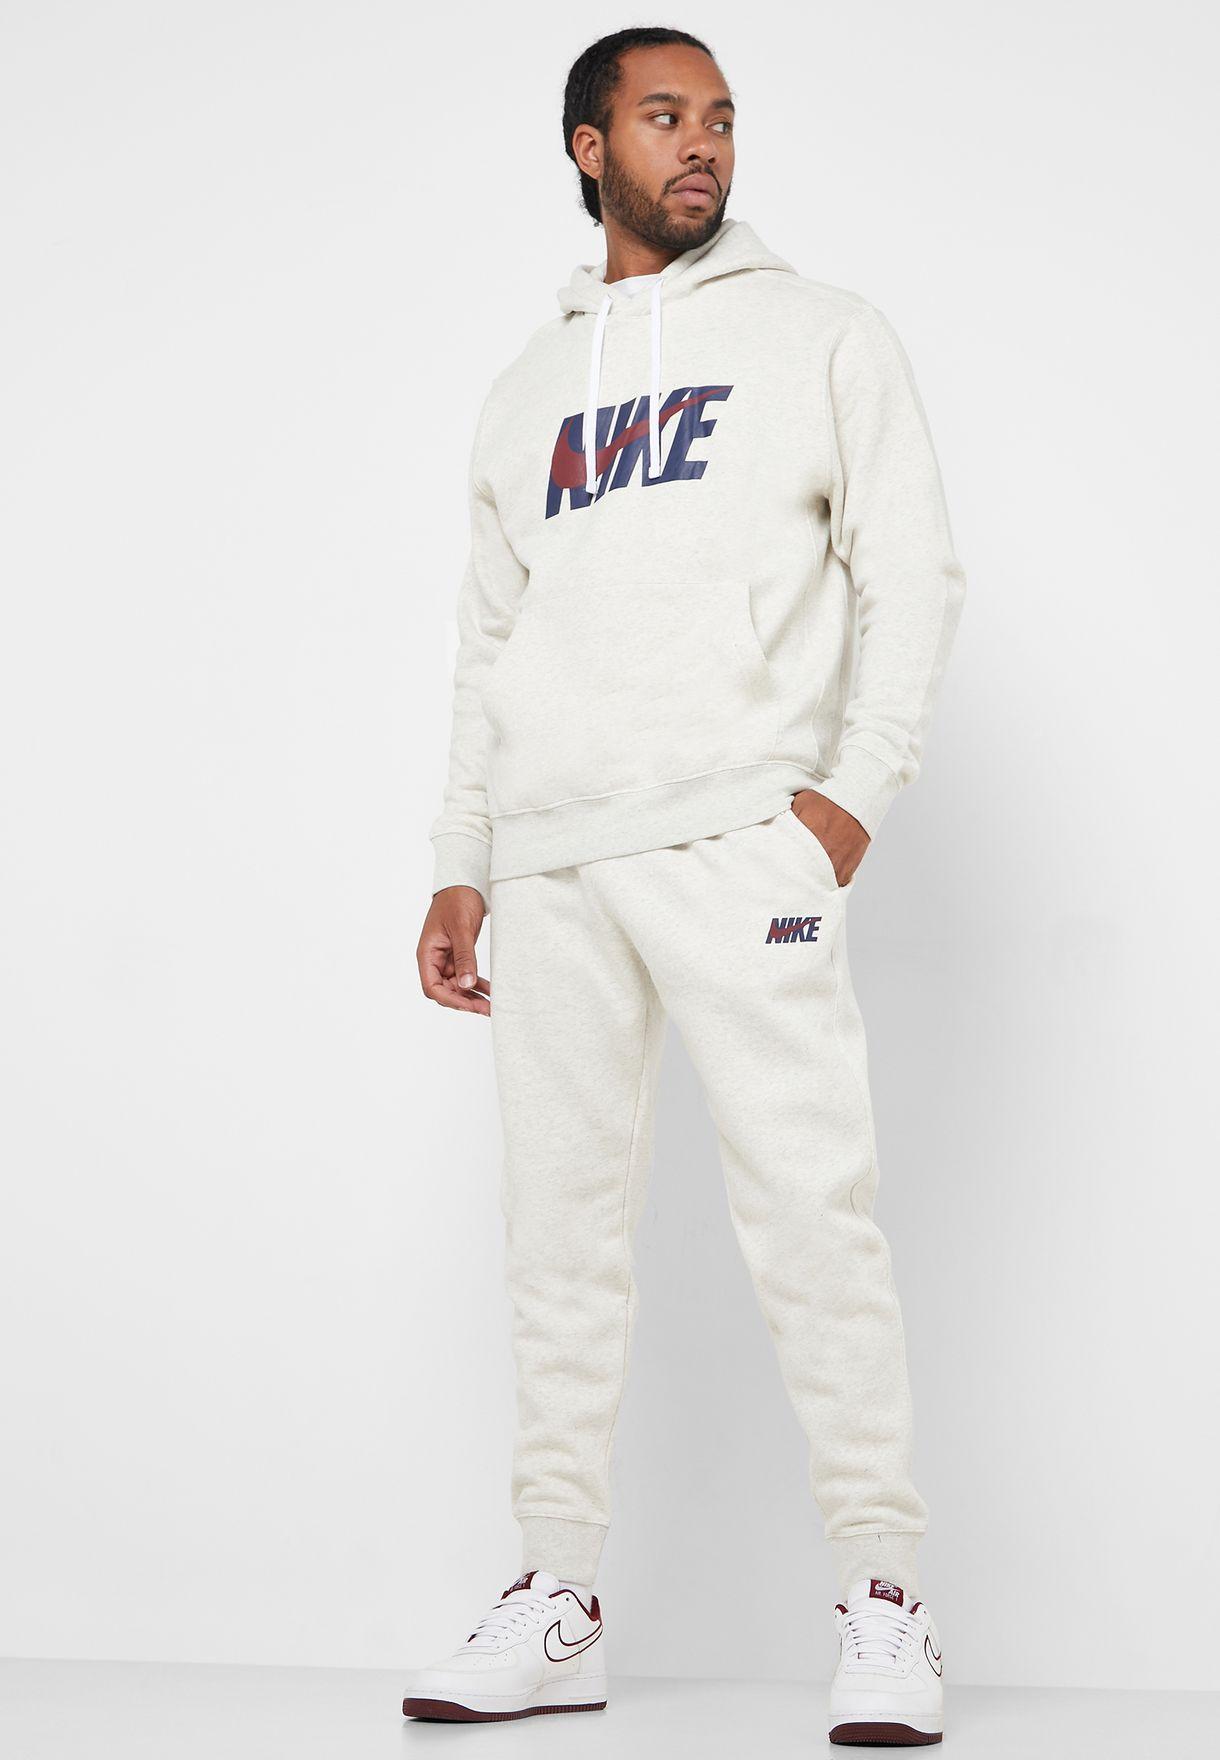 NSW Fleece Graphic Hoodie + sweatpants set